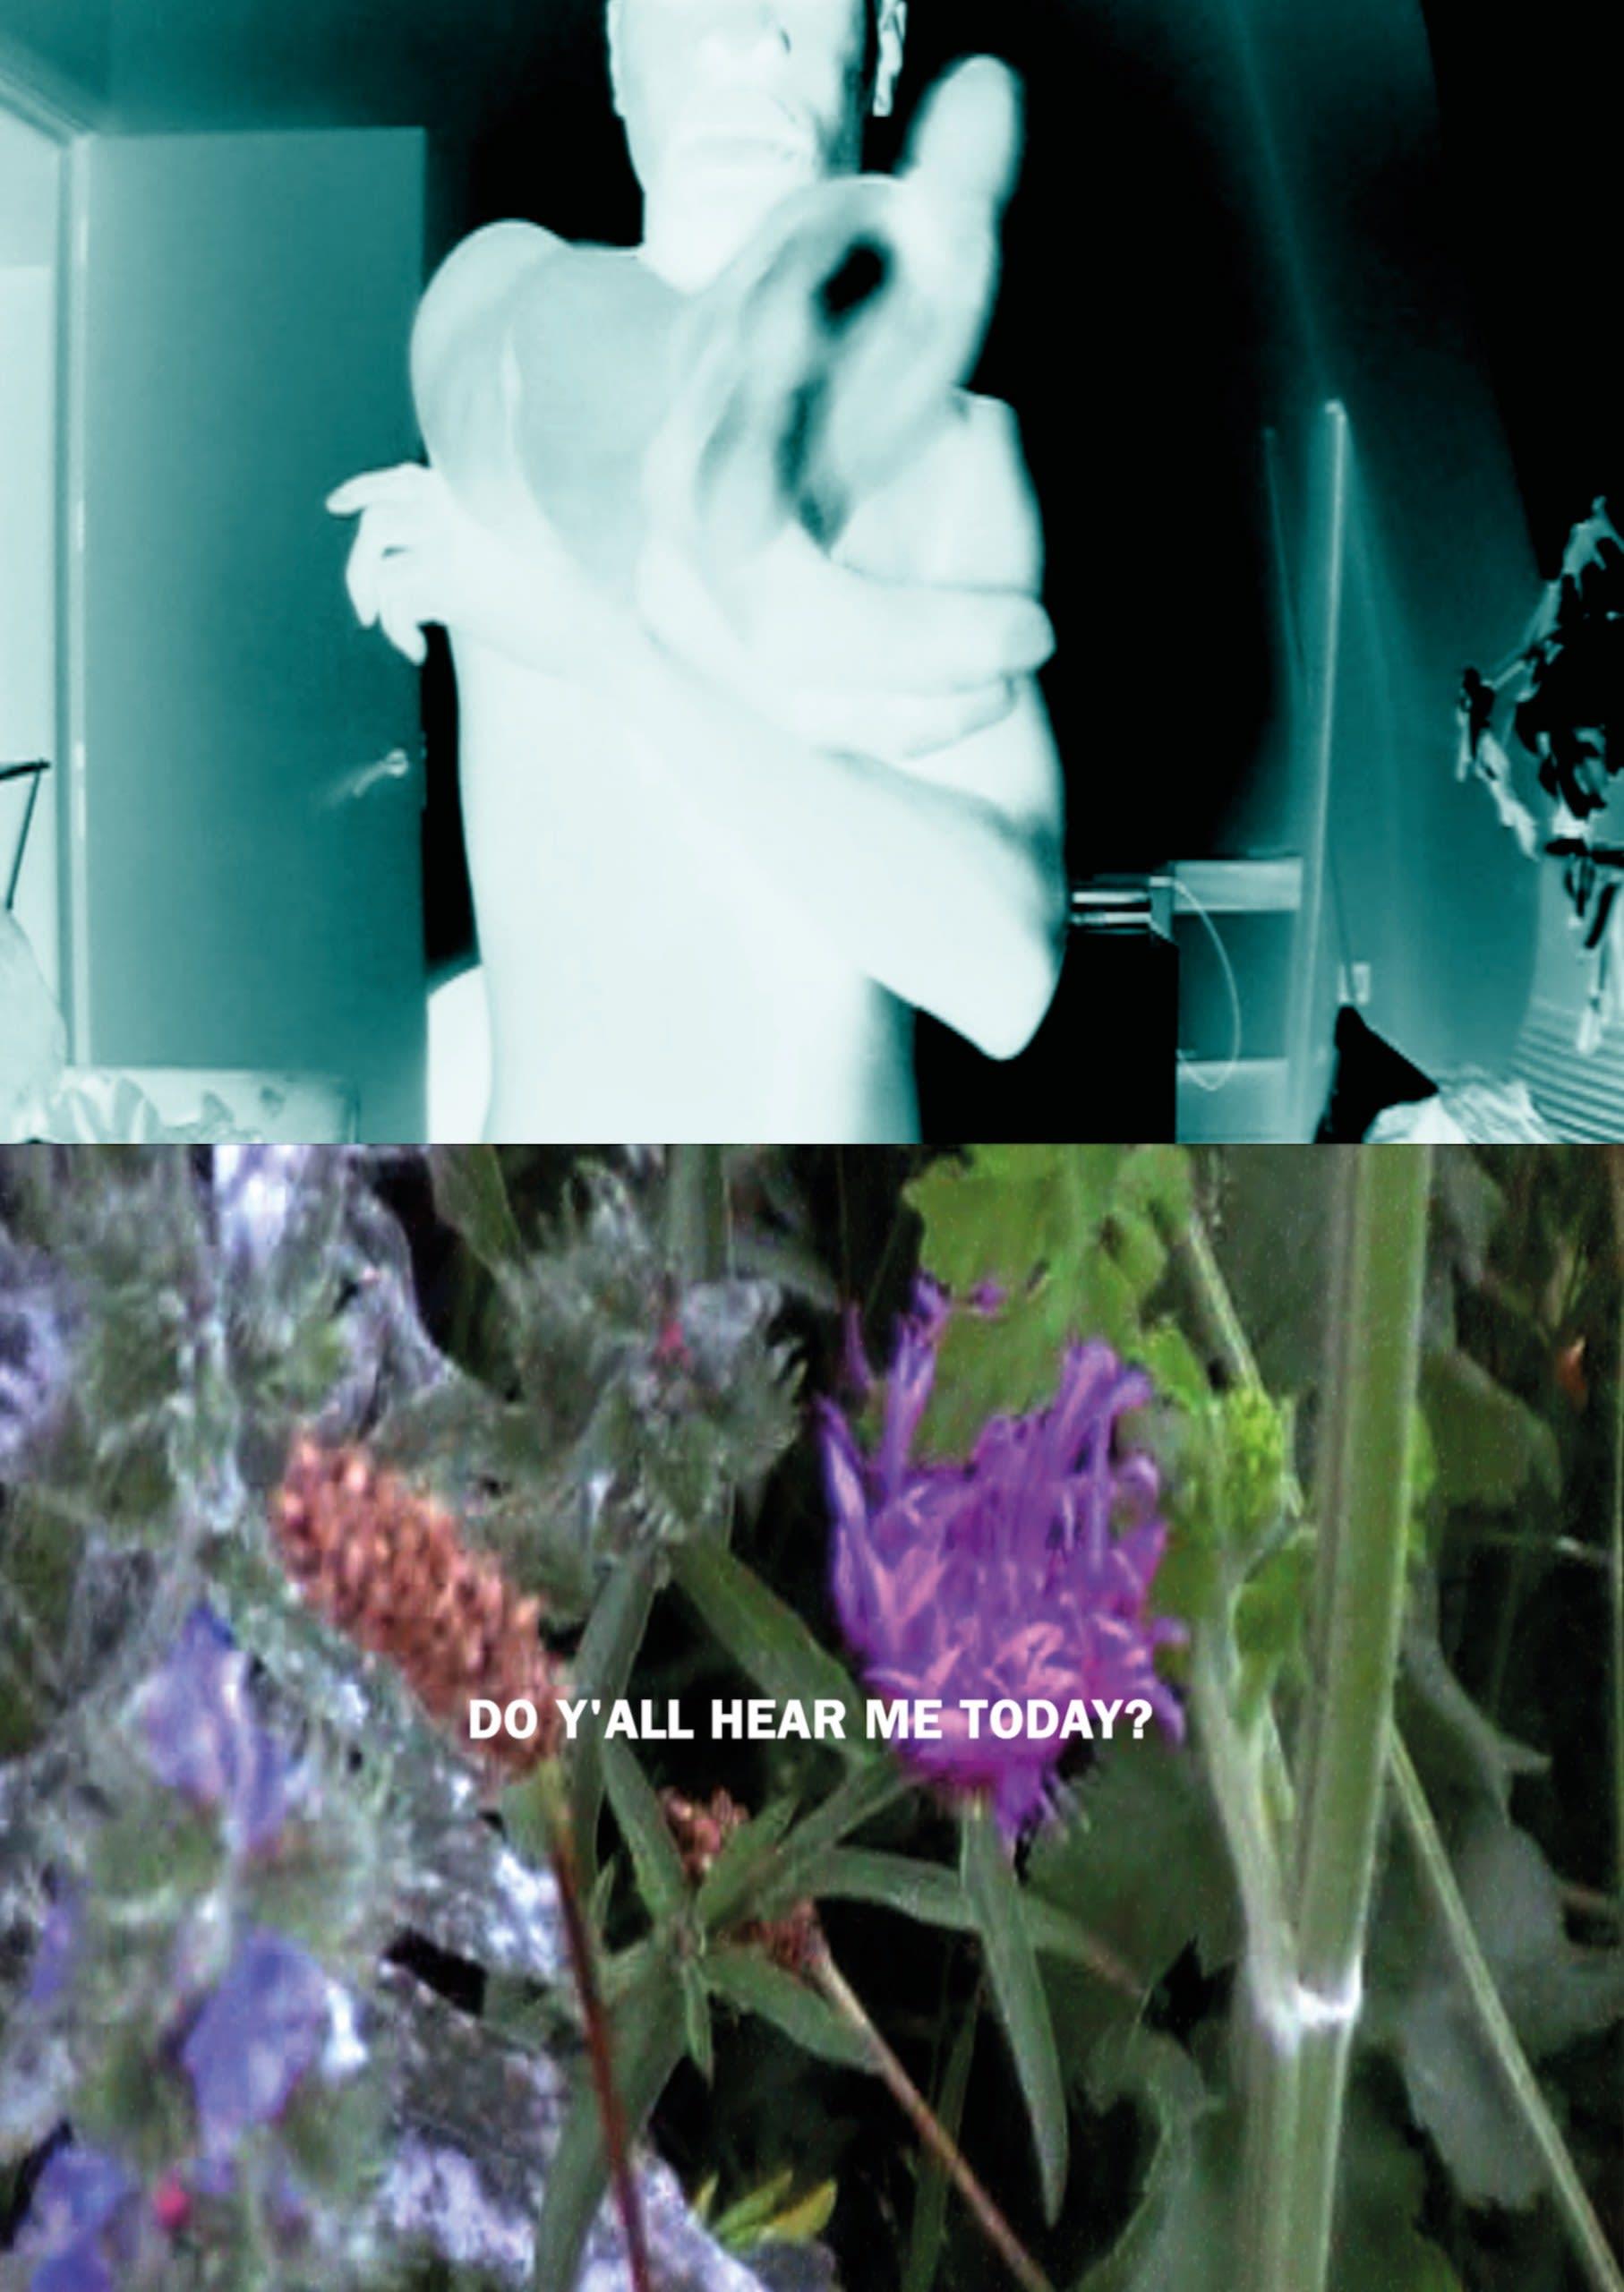 Make Me Save, Video Stills 02